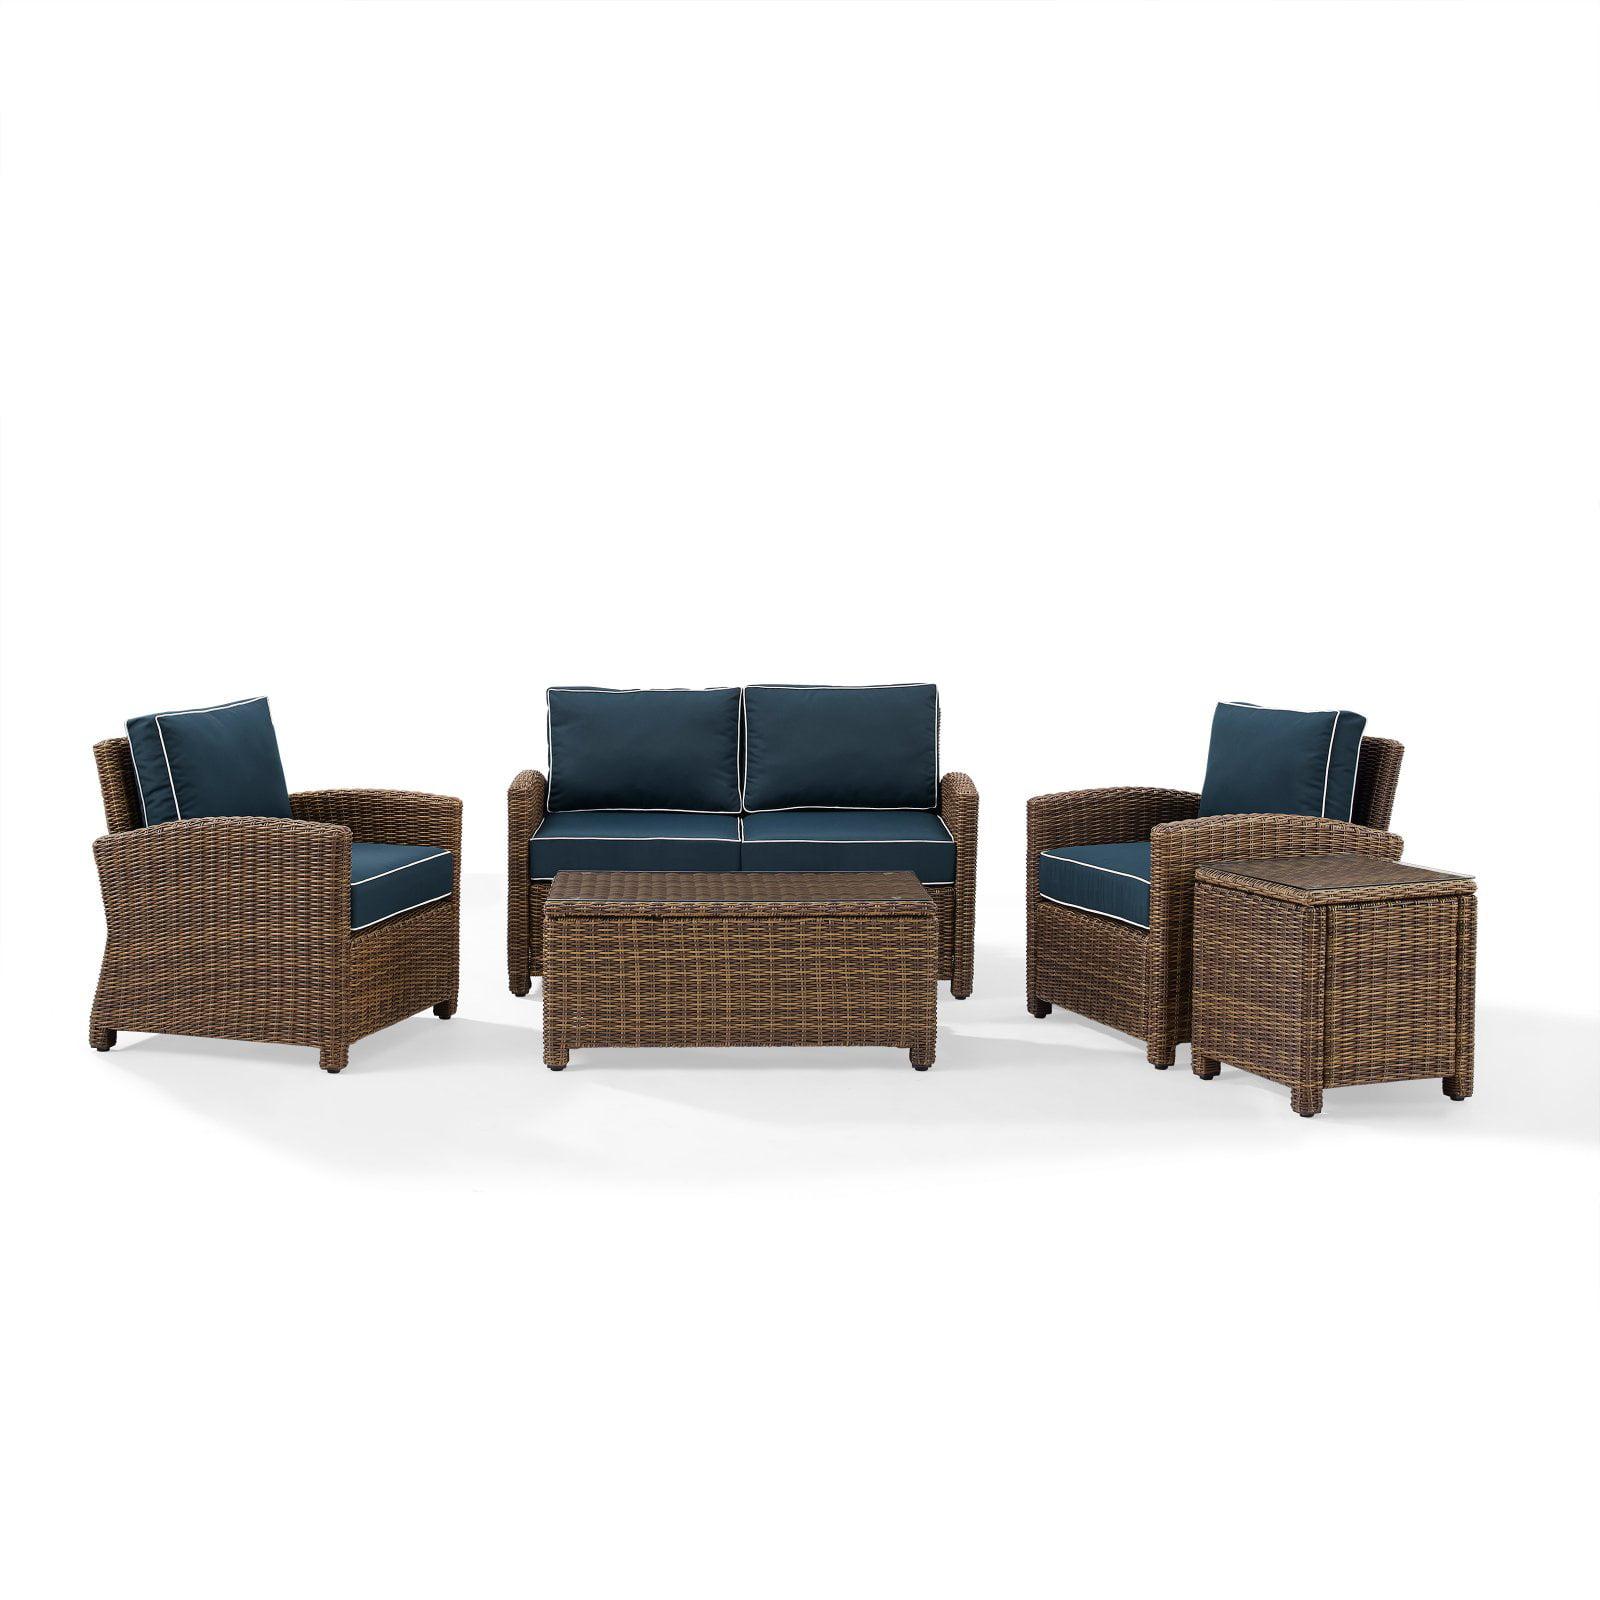 Outdoor Furniture Covers Singapore: Crosley Furniture Bradenton 5-Piece Outdoor Wicker